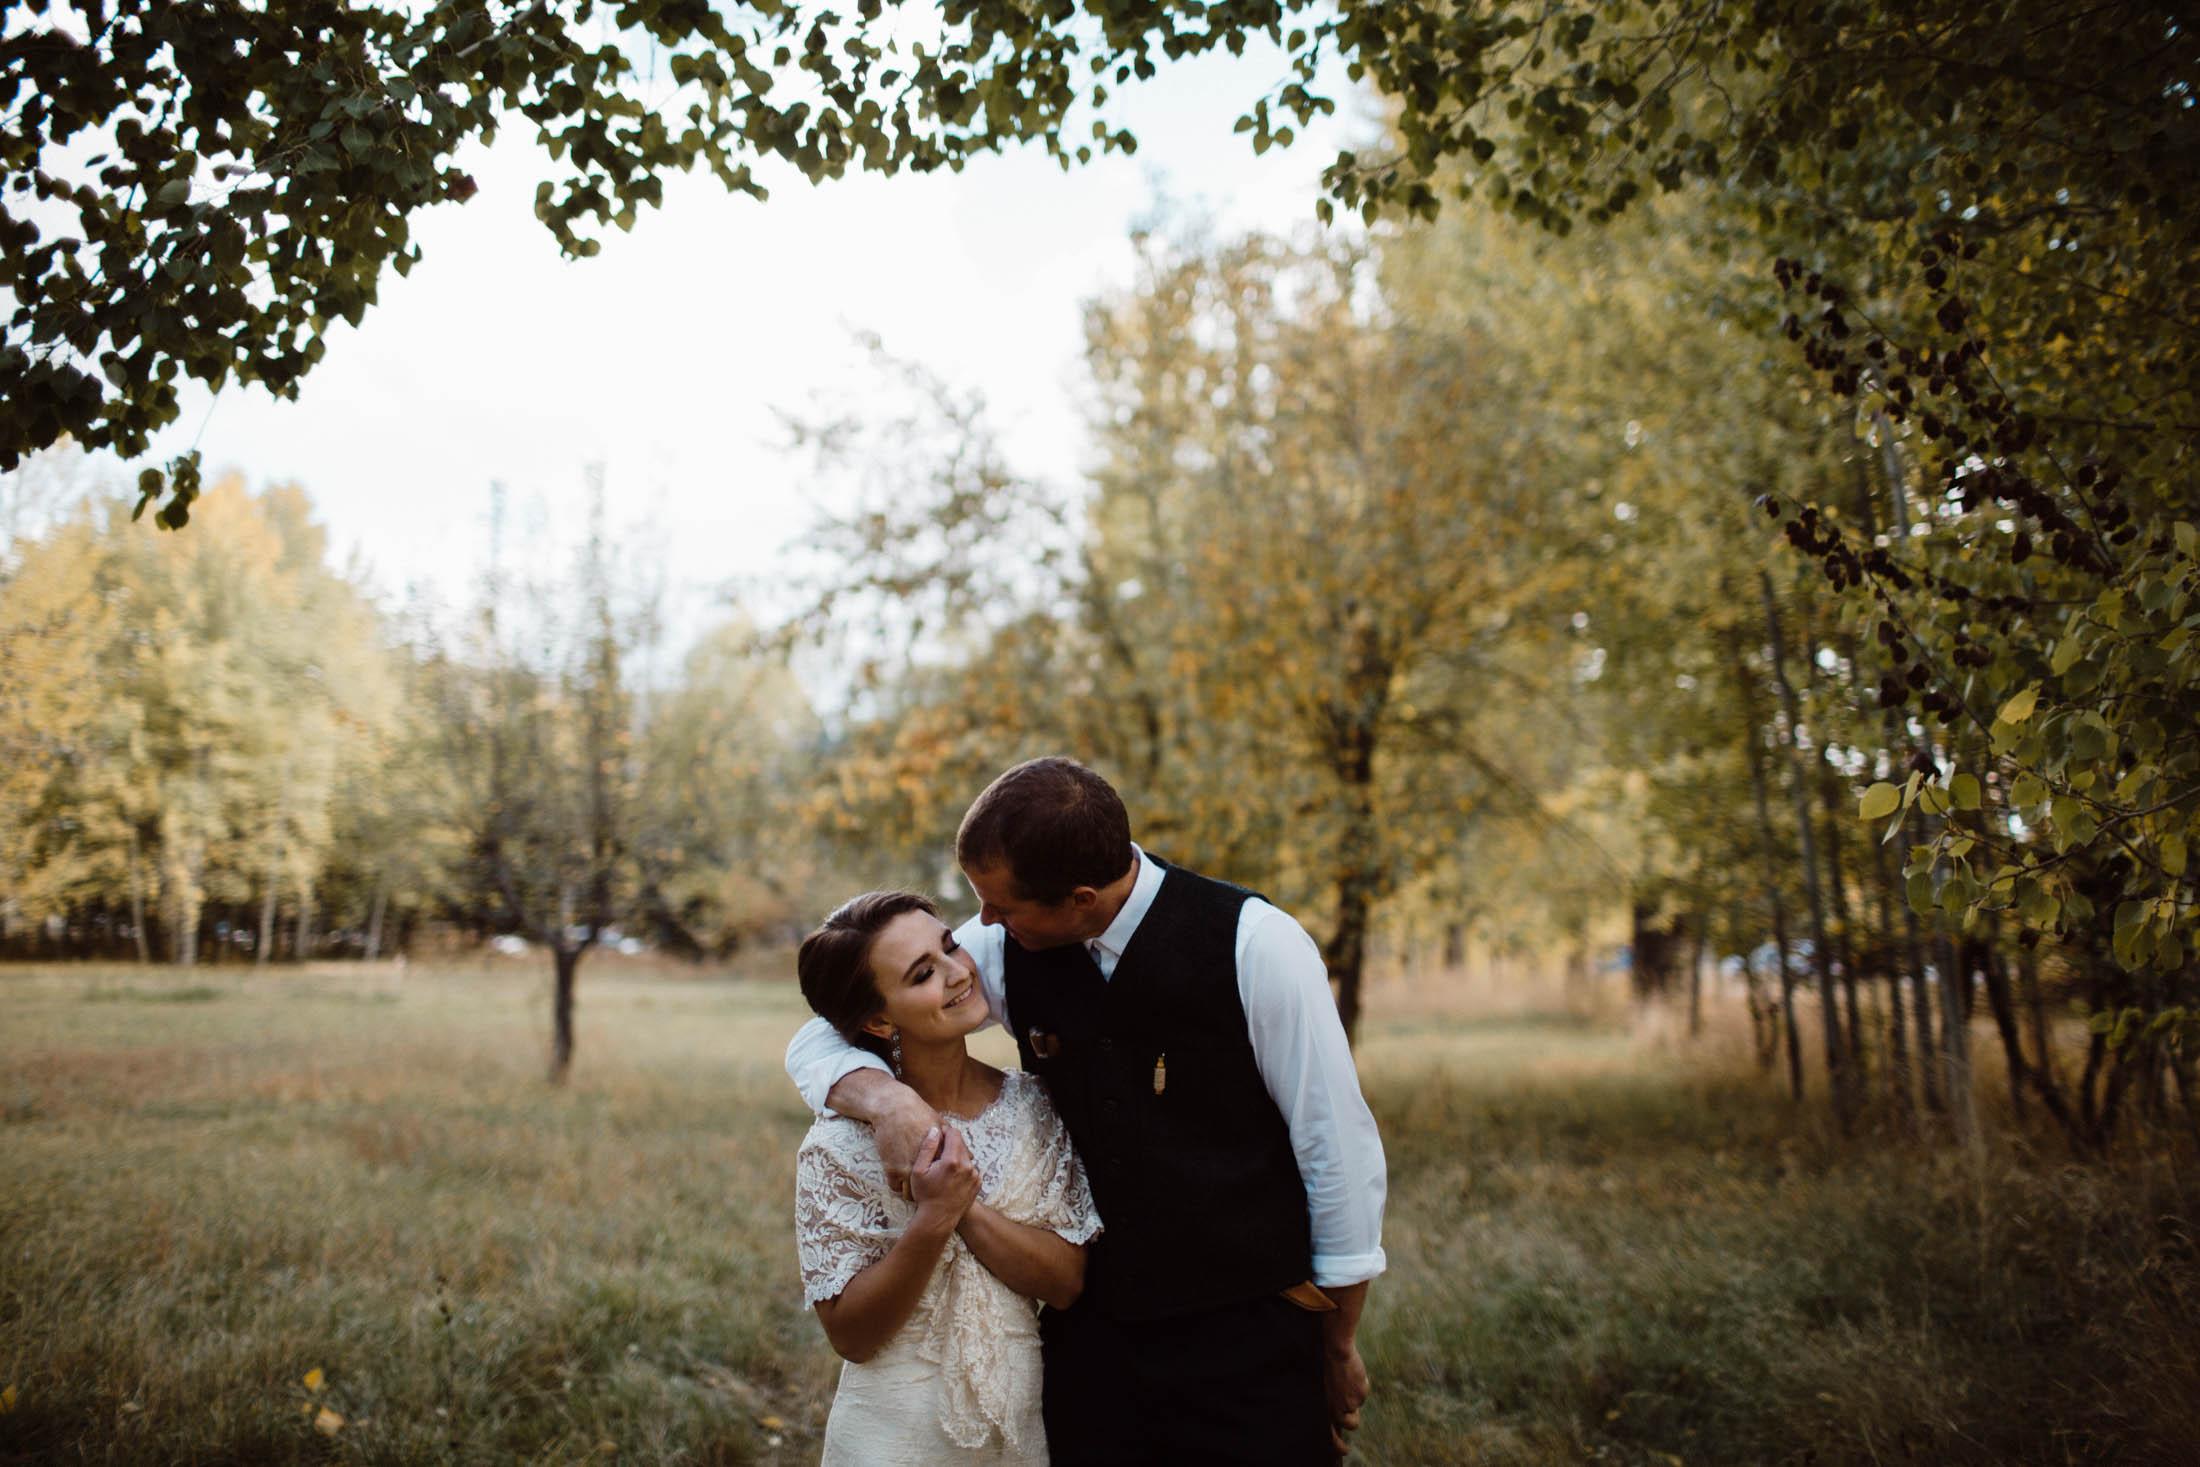 Nolan & Tanner | Married